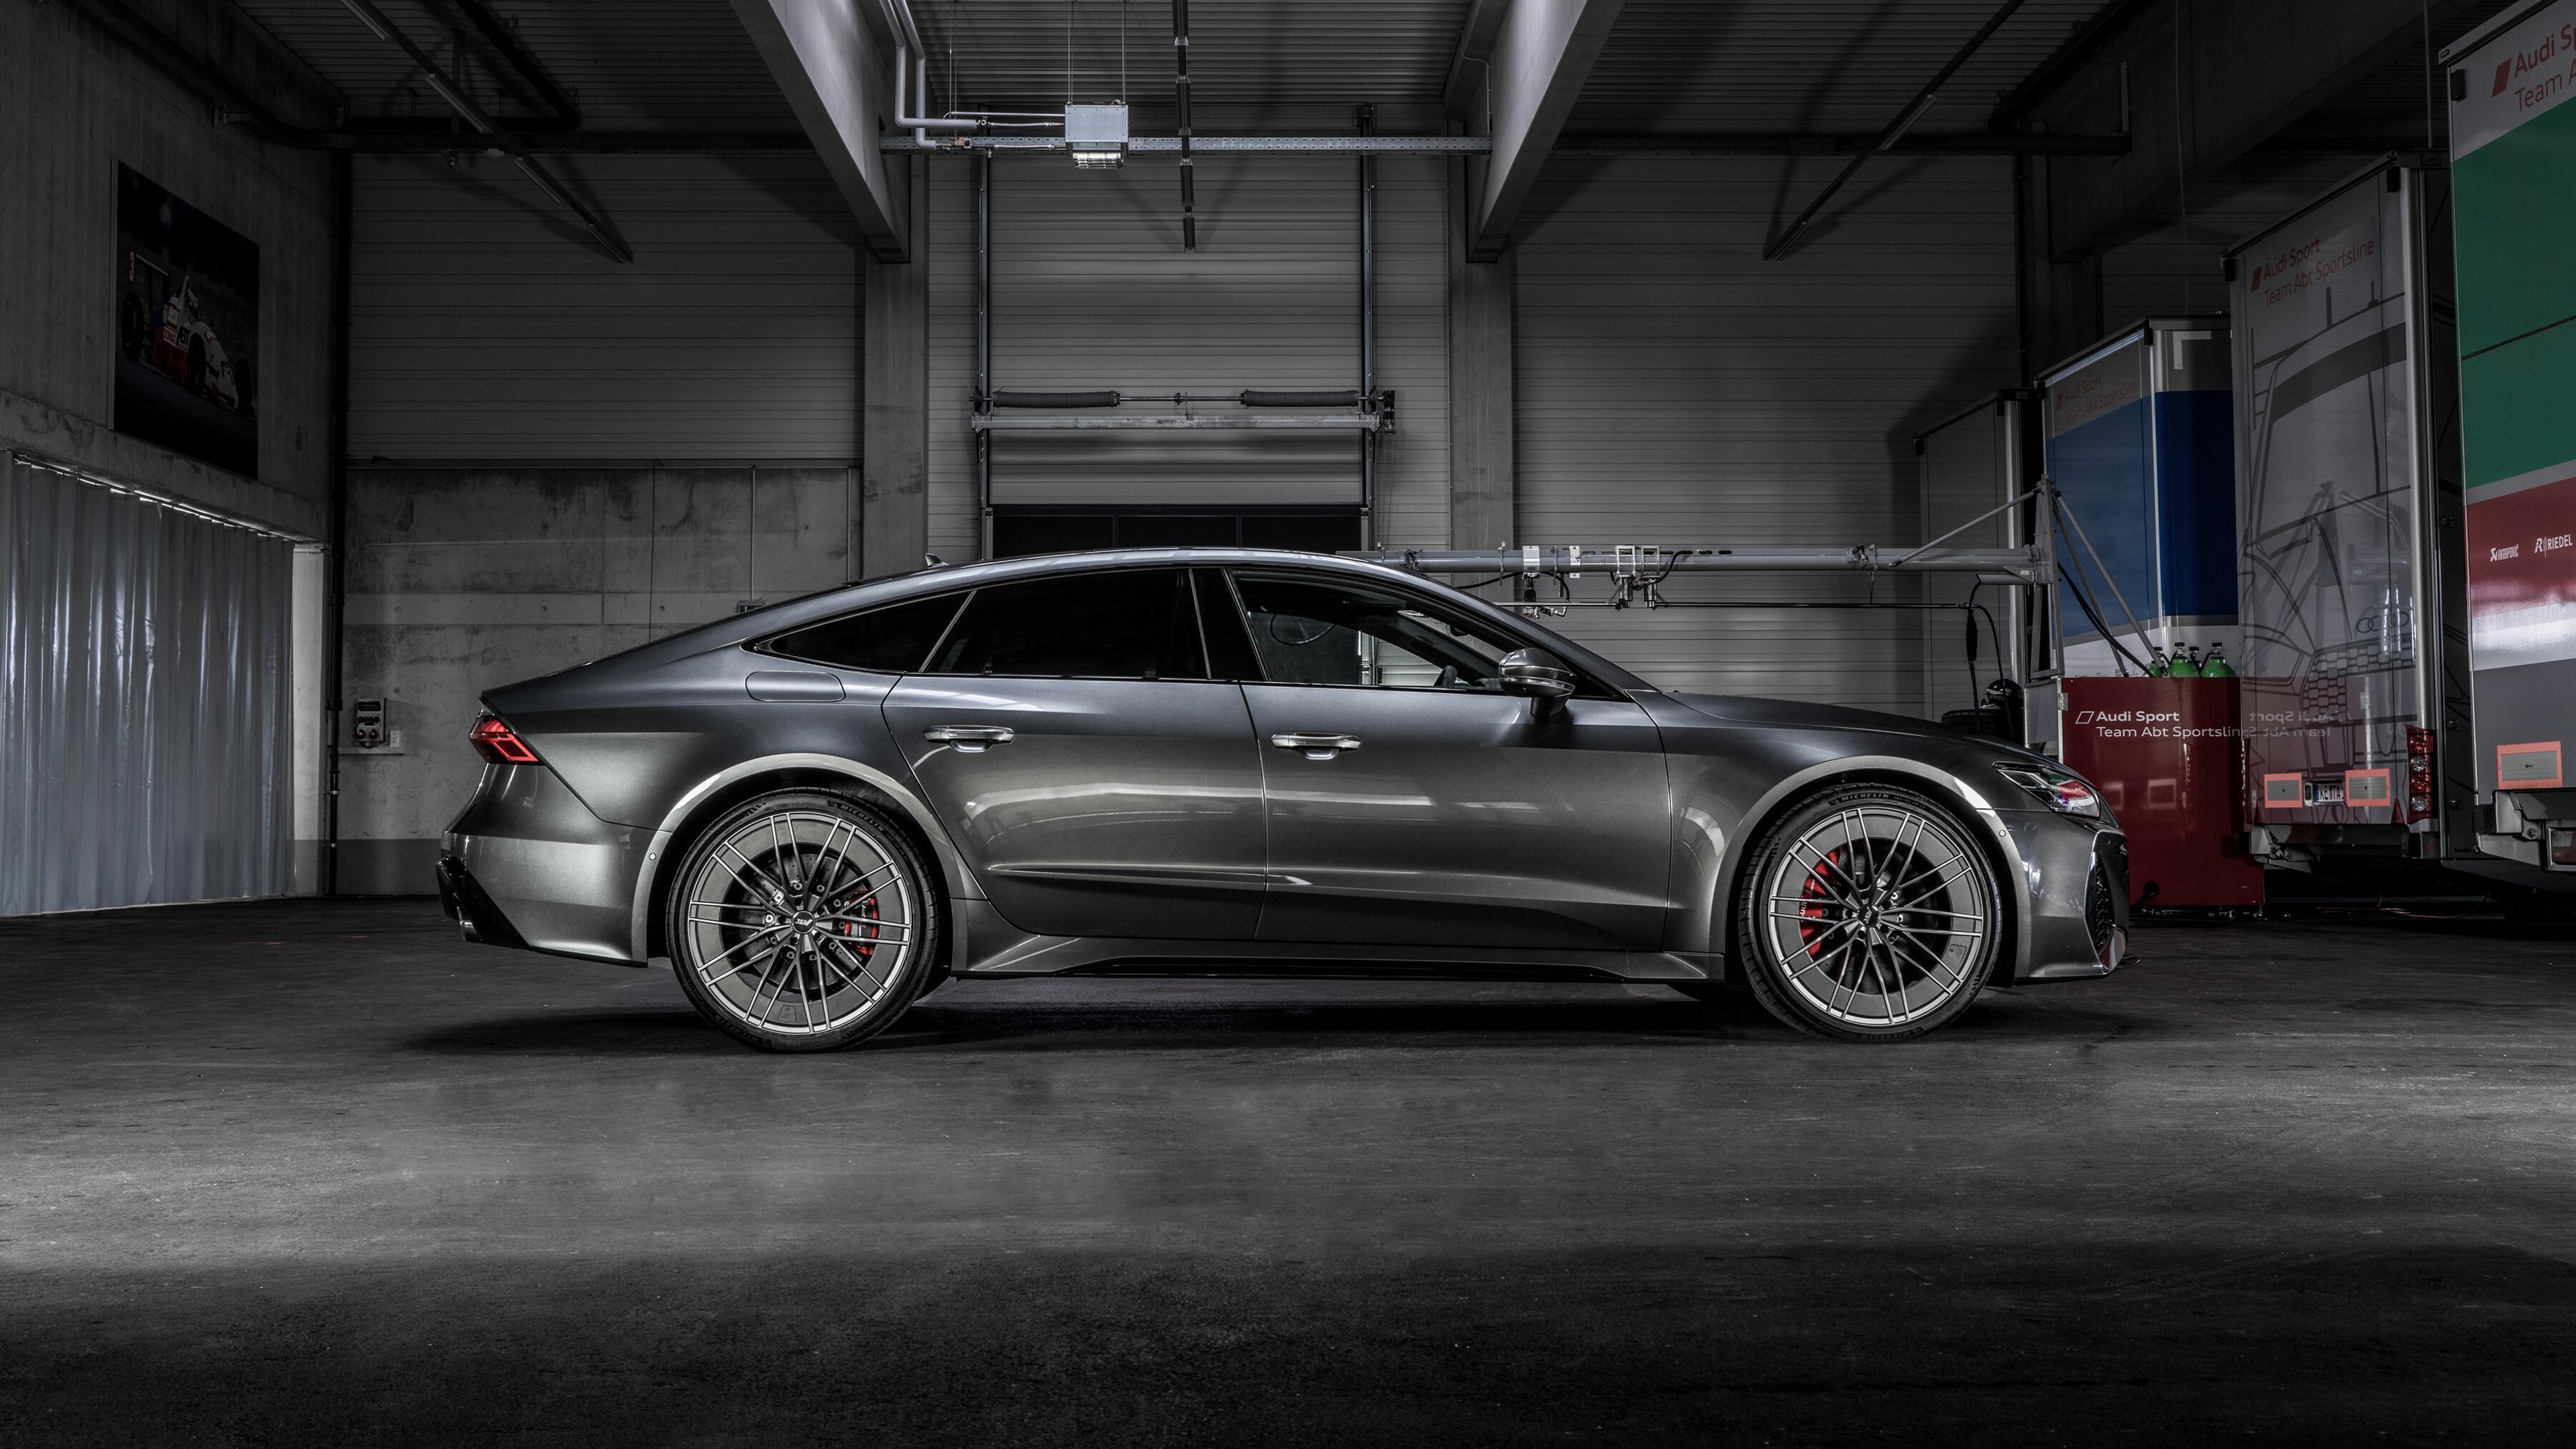 Abt Audi Rs 7 Sportback 2020 4k 2 Wallpaper Hd Car Wallpapers Id 14241